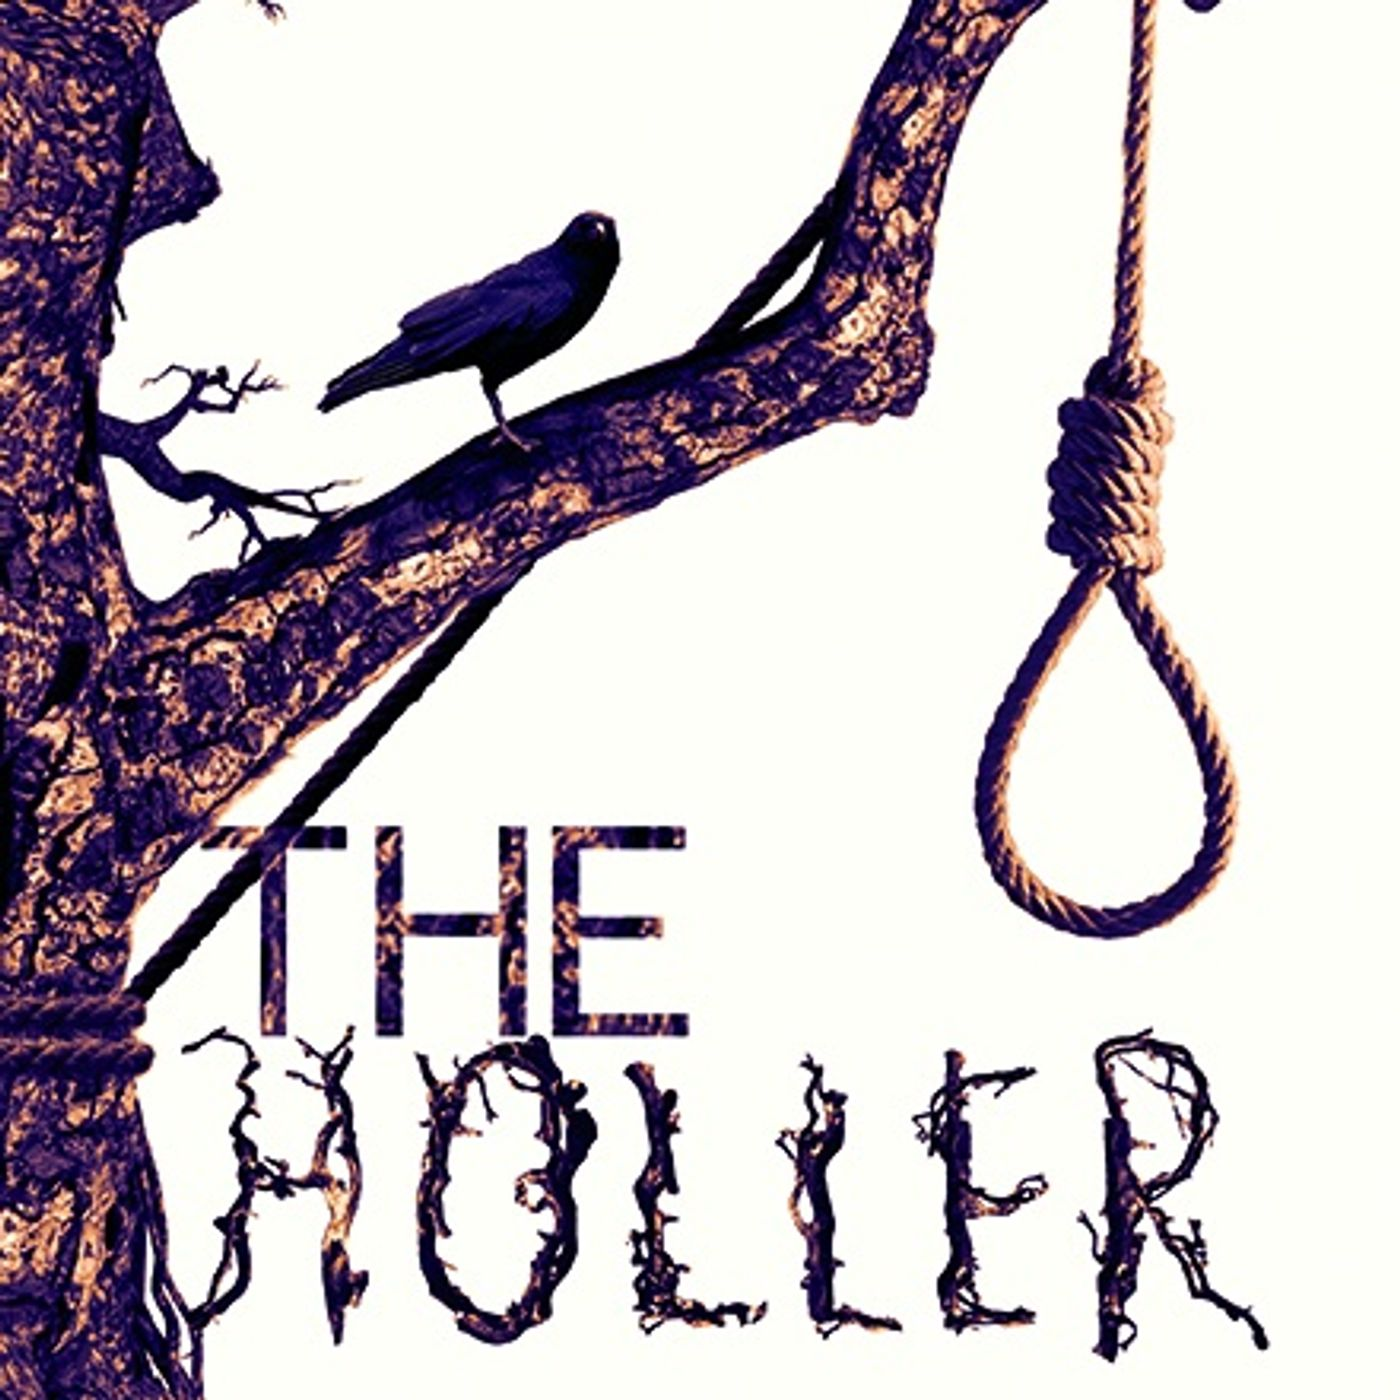 The Holler - Prologue